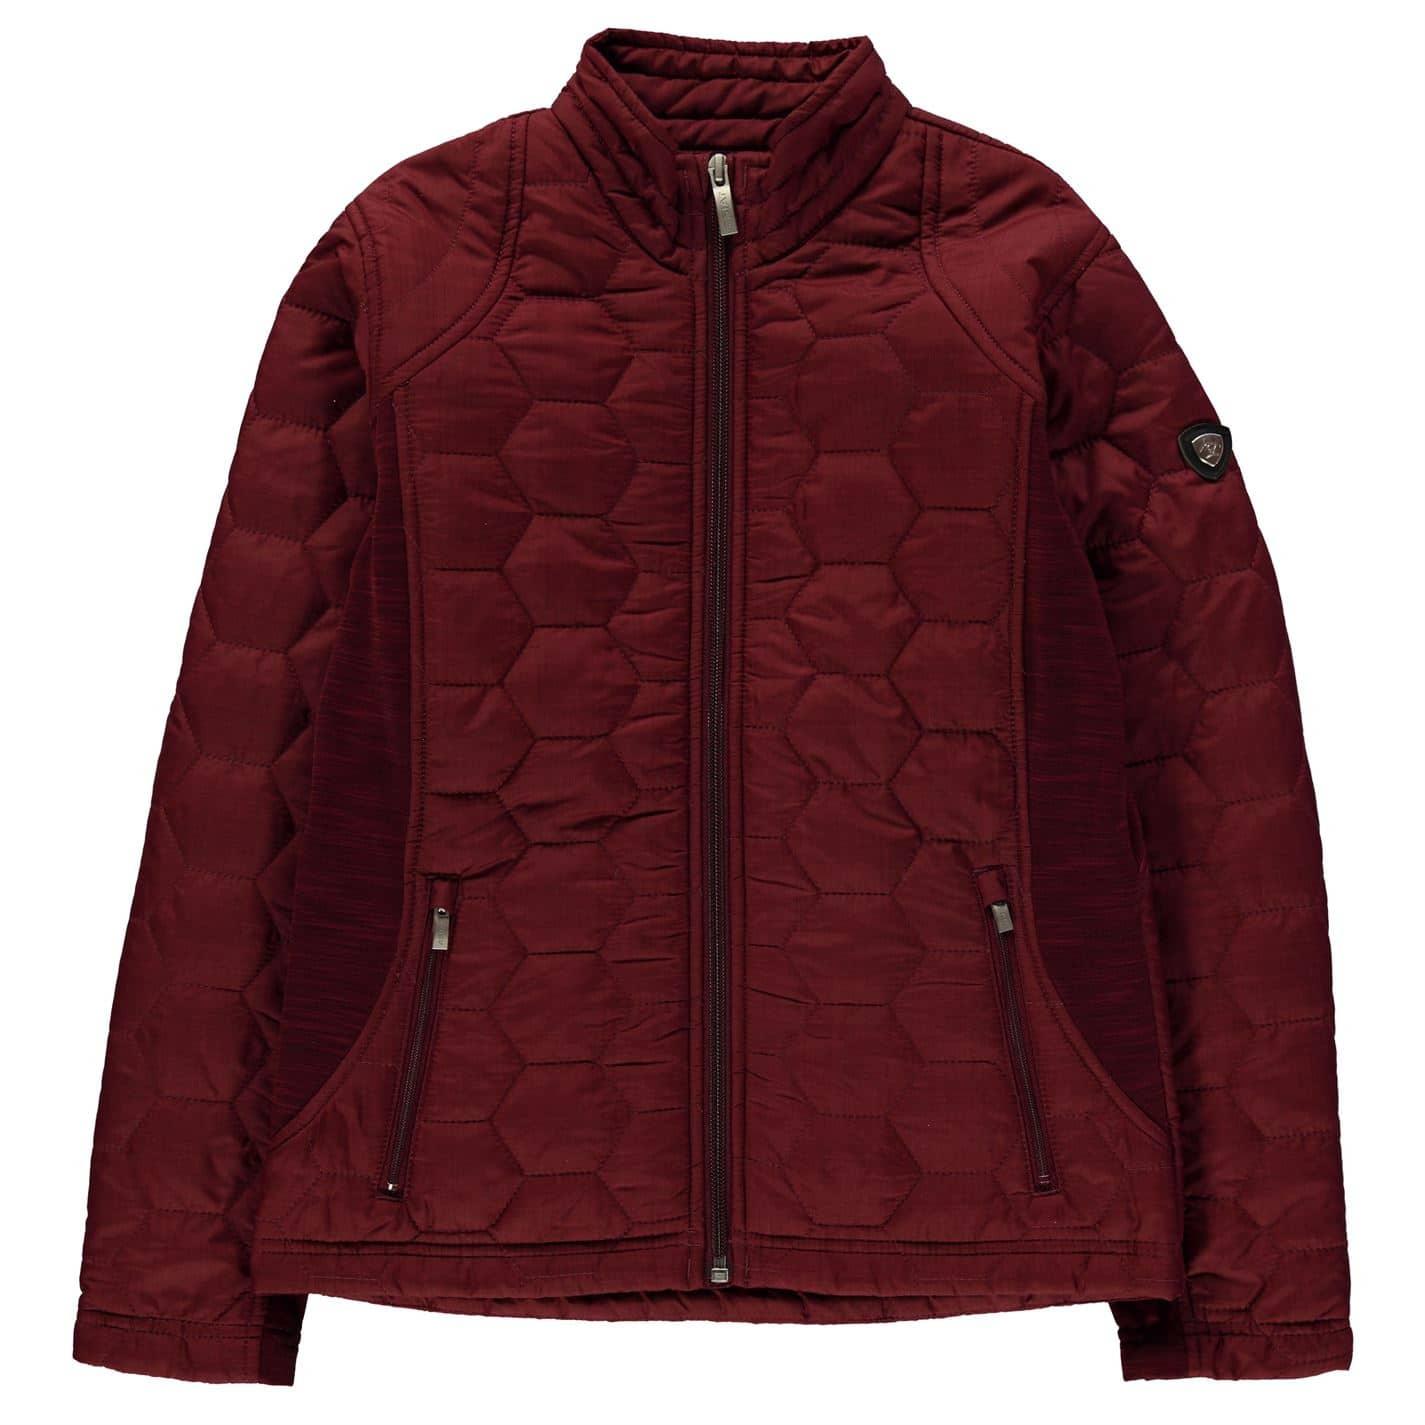 Ariat Junior Volt Jacket